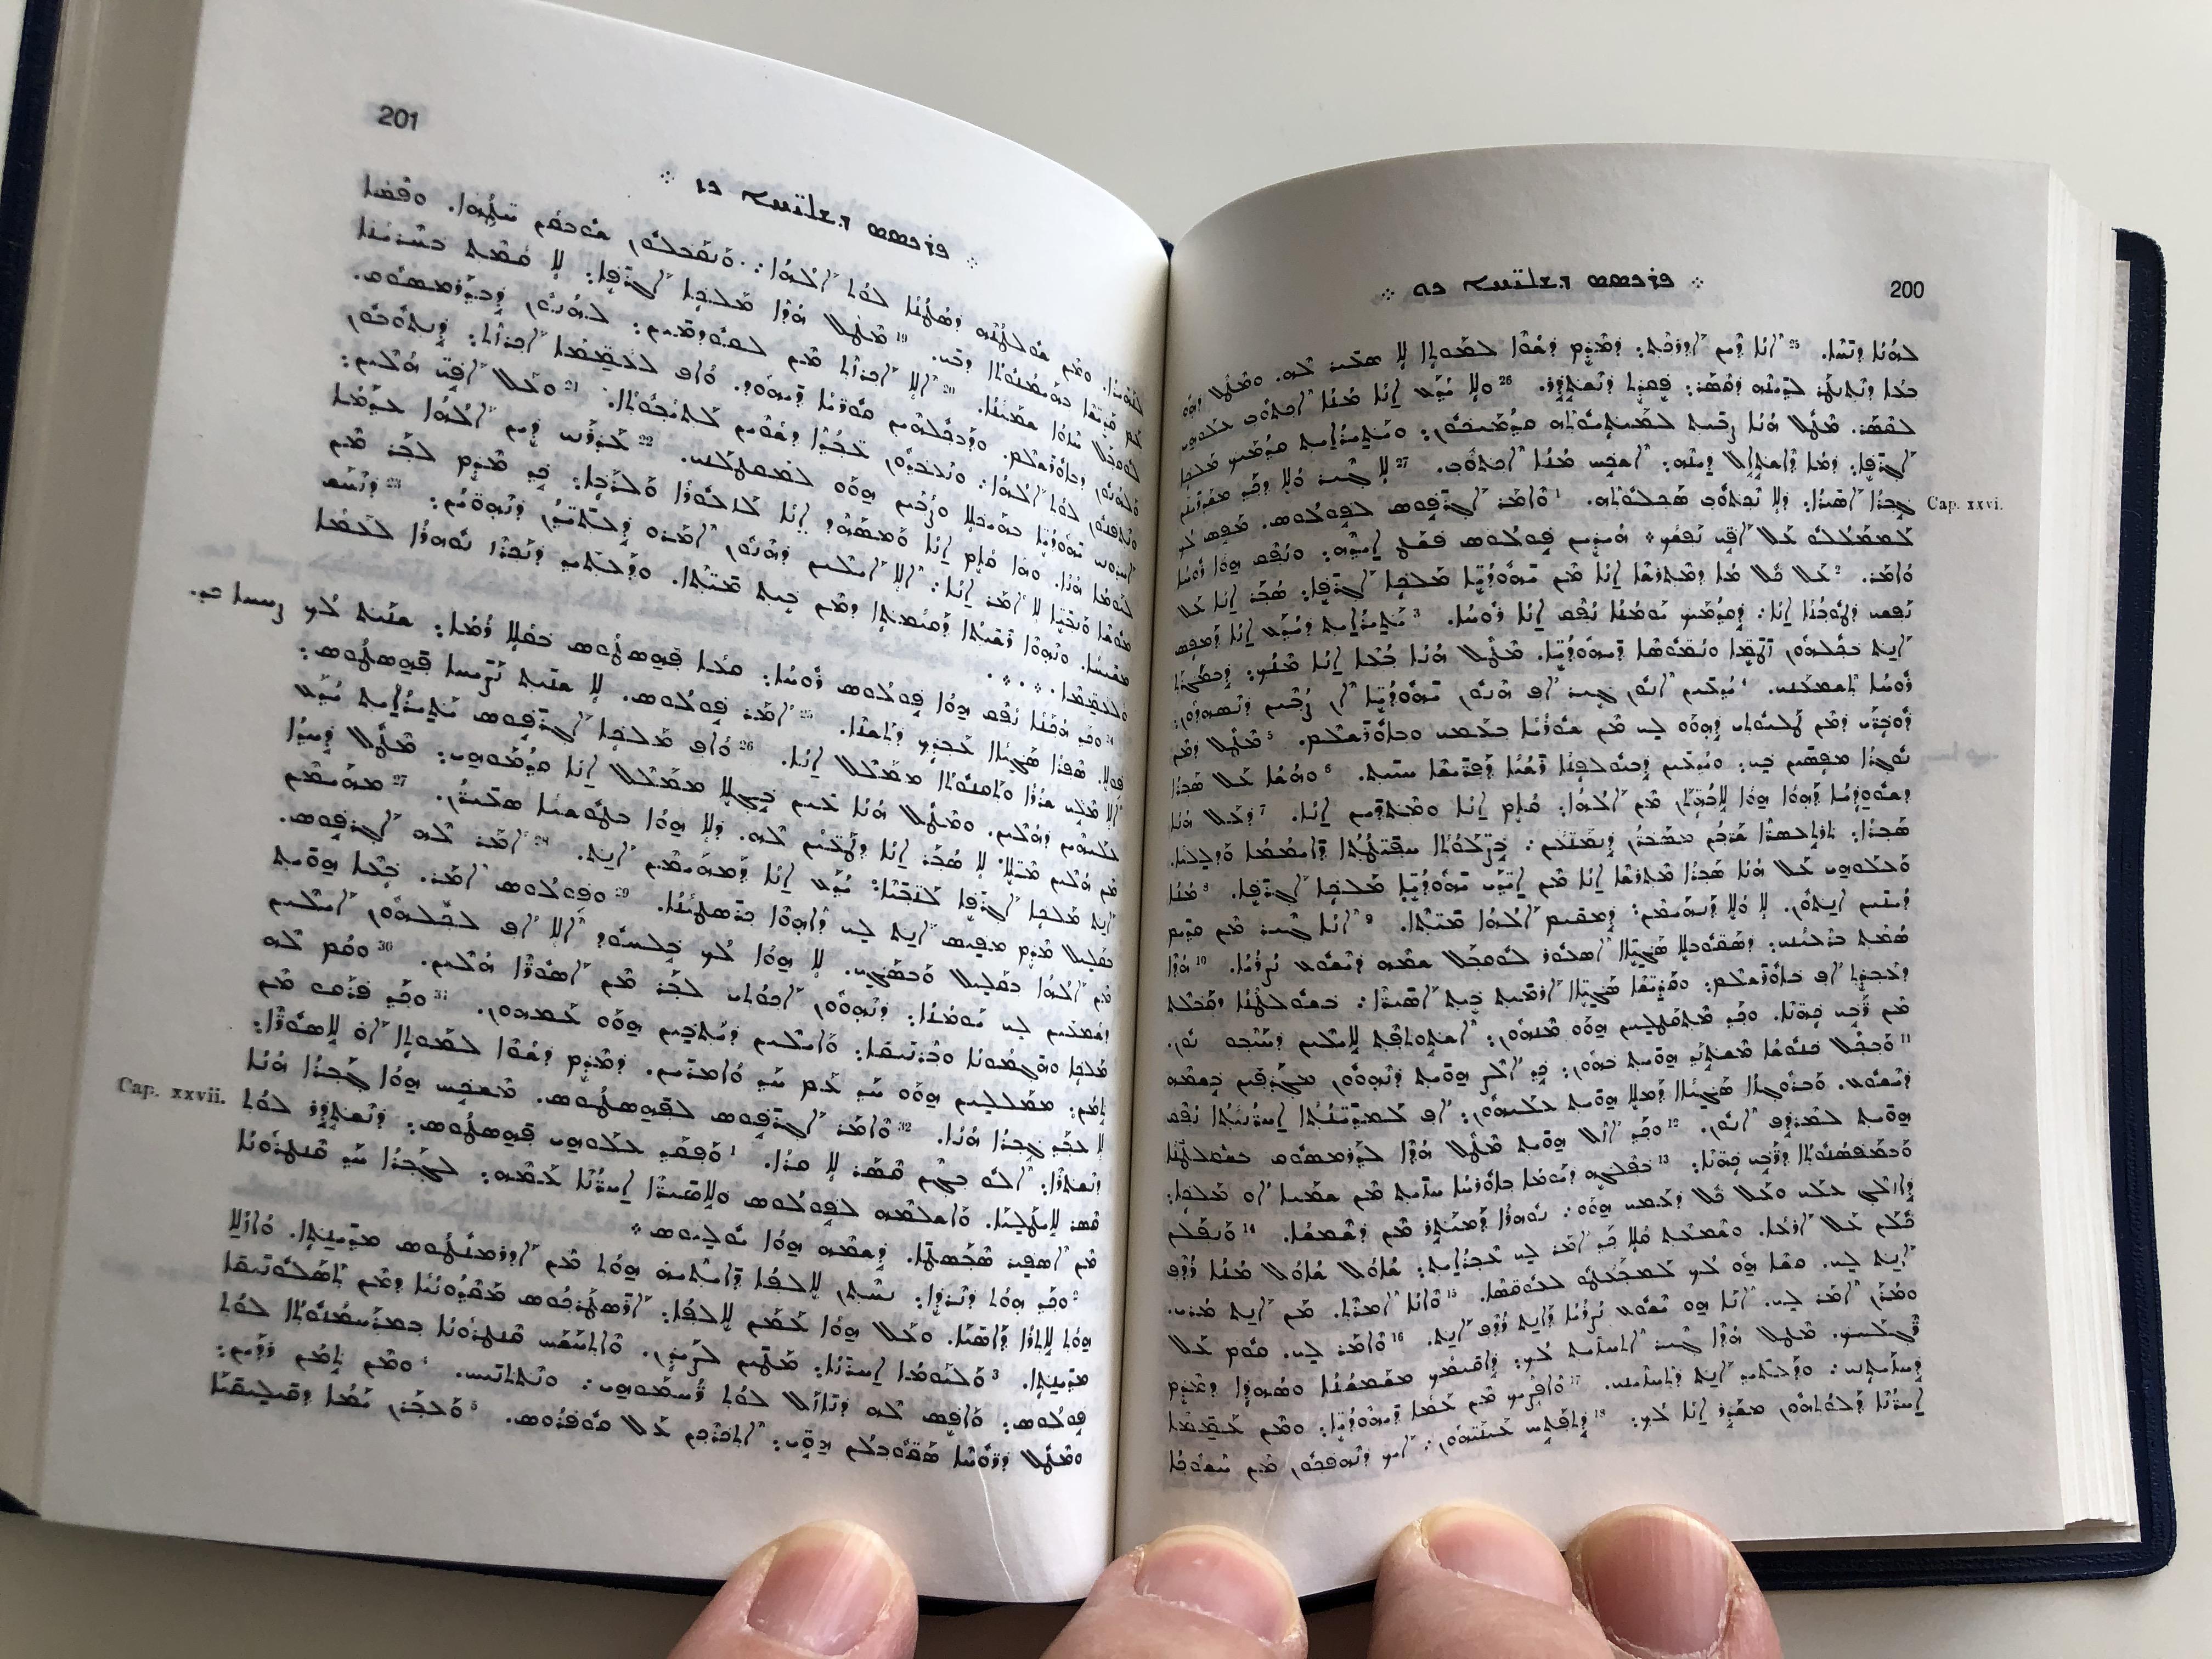 syriac-new-testament-and-psalms-s-ryanice-incil-ve-mezmurlar-blue-pocket-size-edition-342-ubs-epf-1991-4m-8.jpg